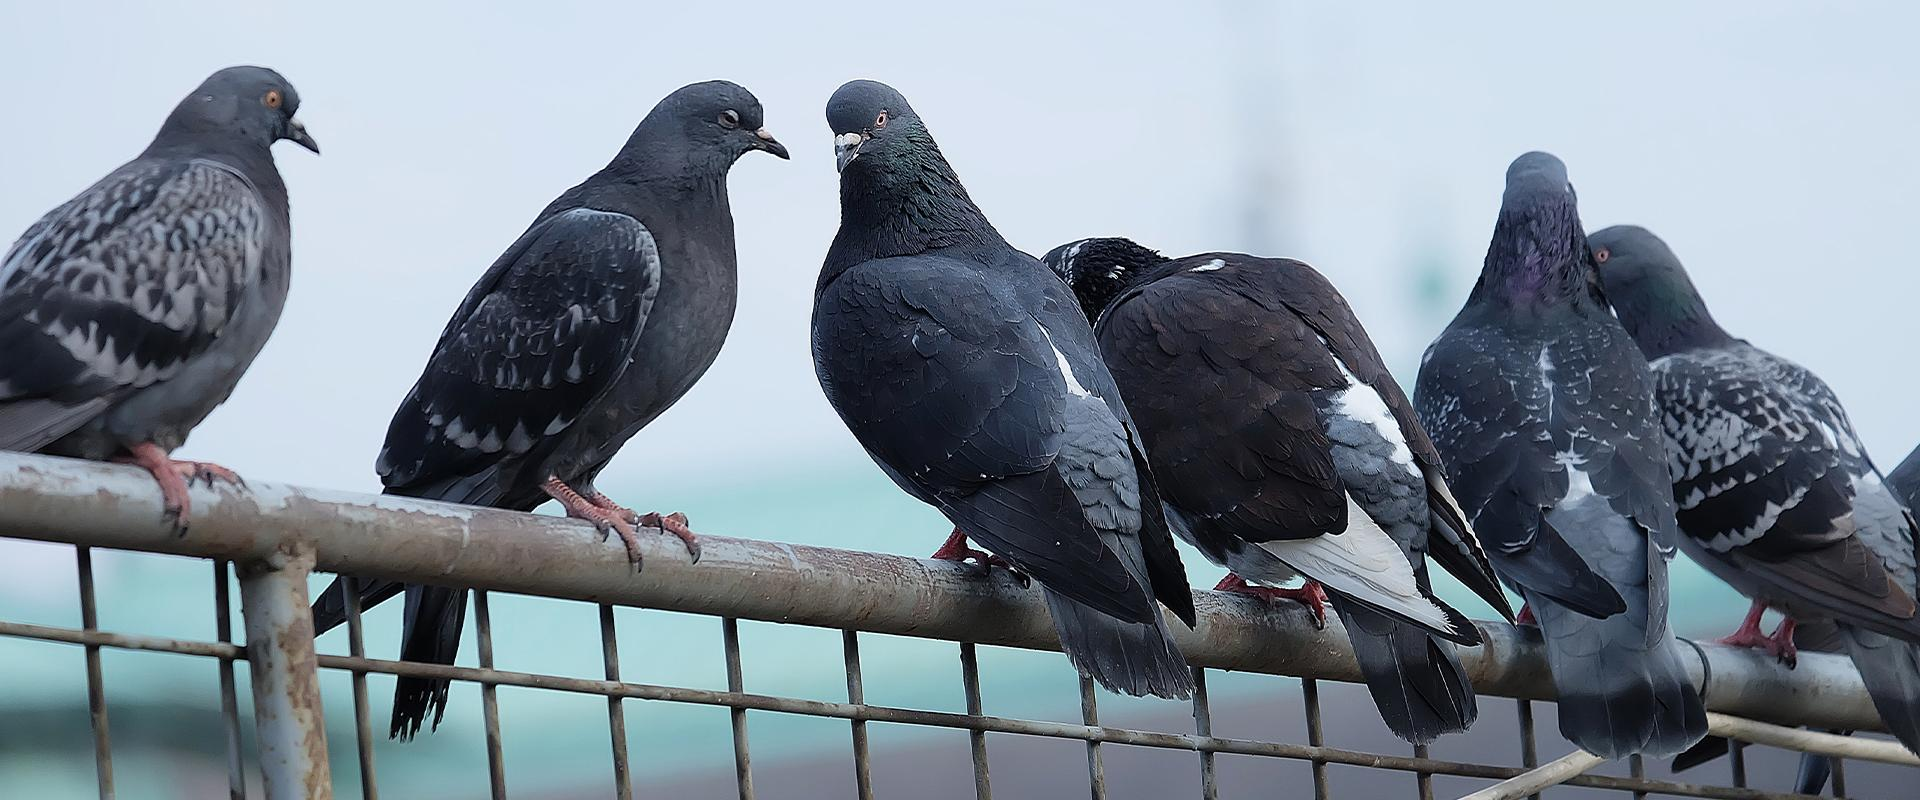 pigeons perched on rail